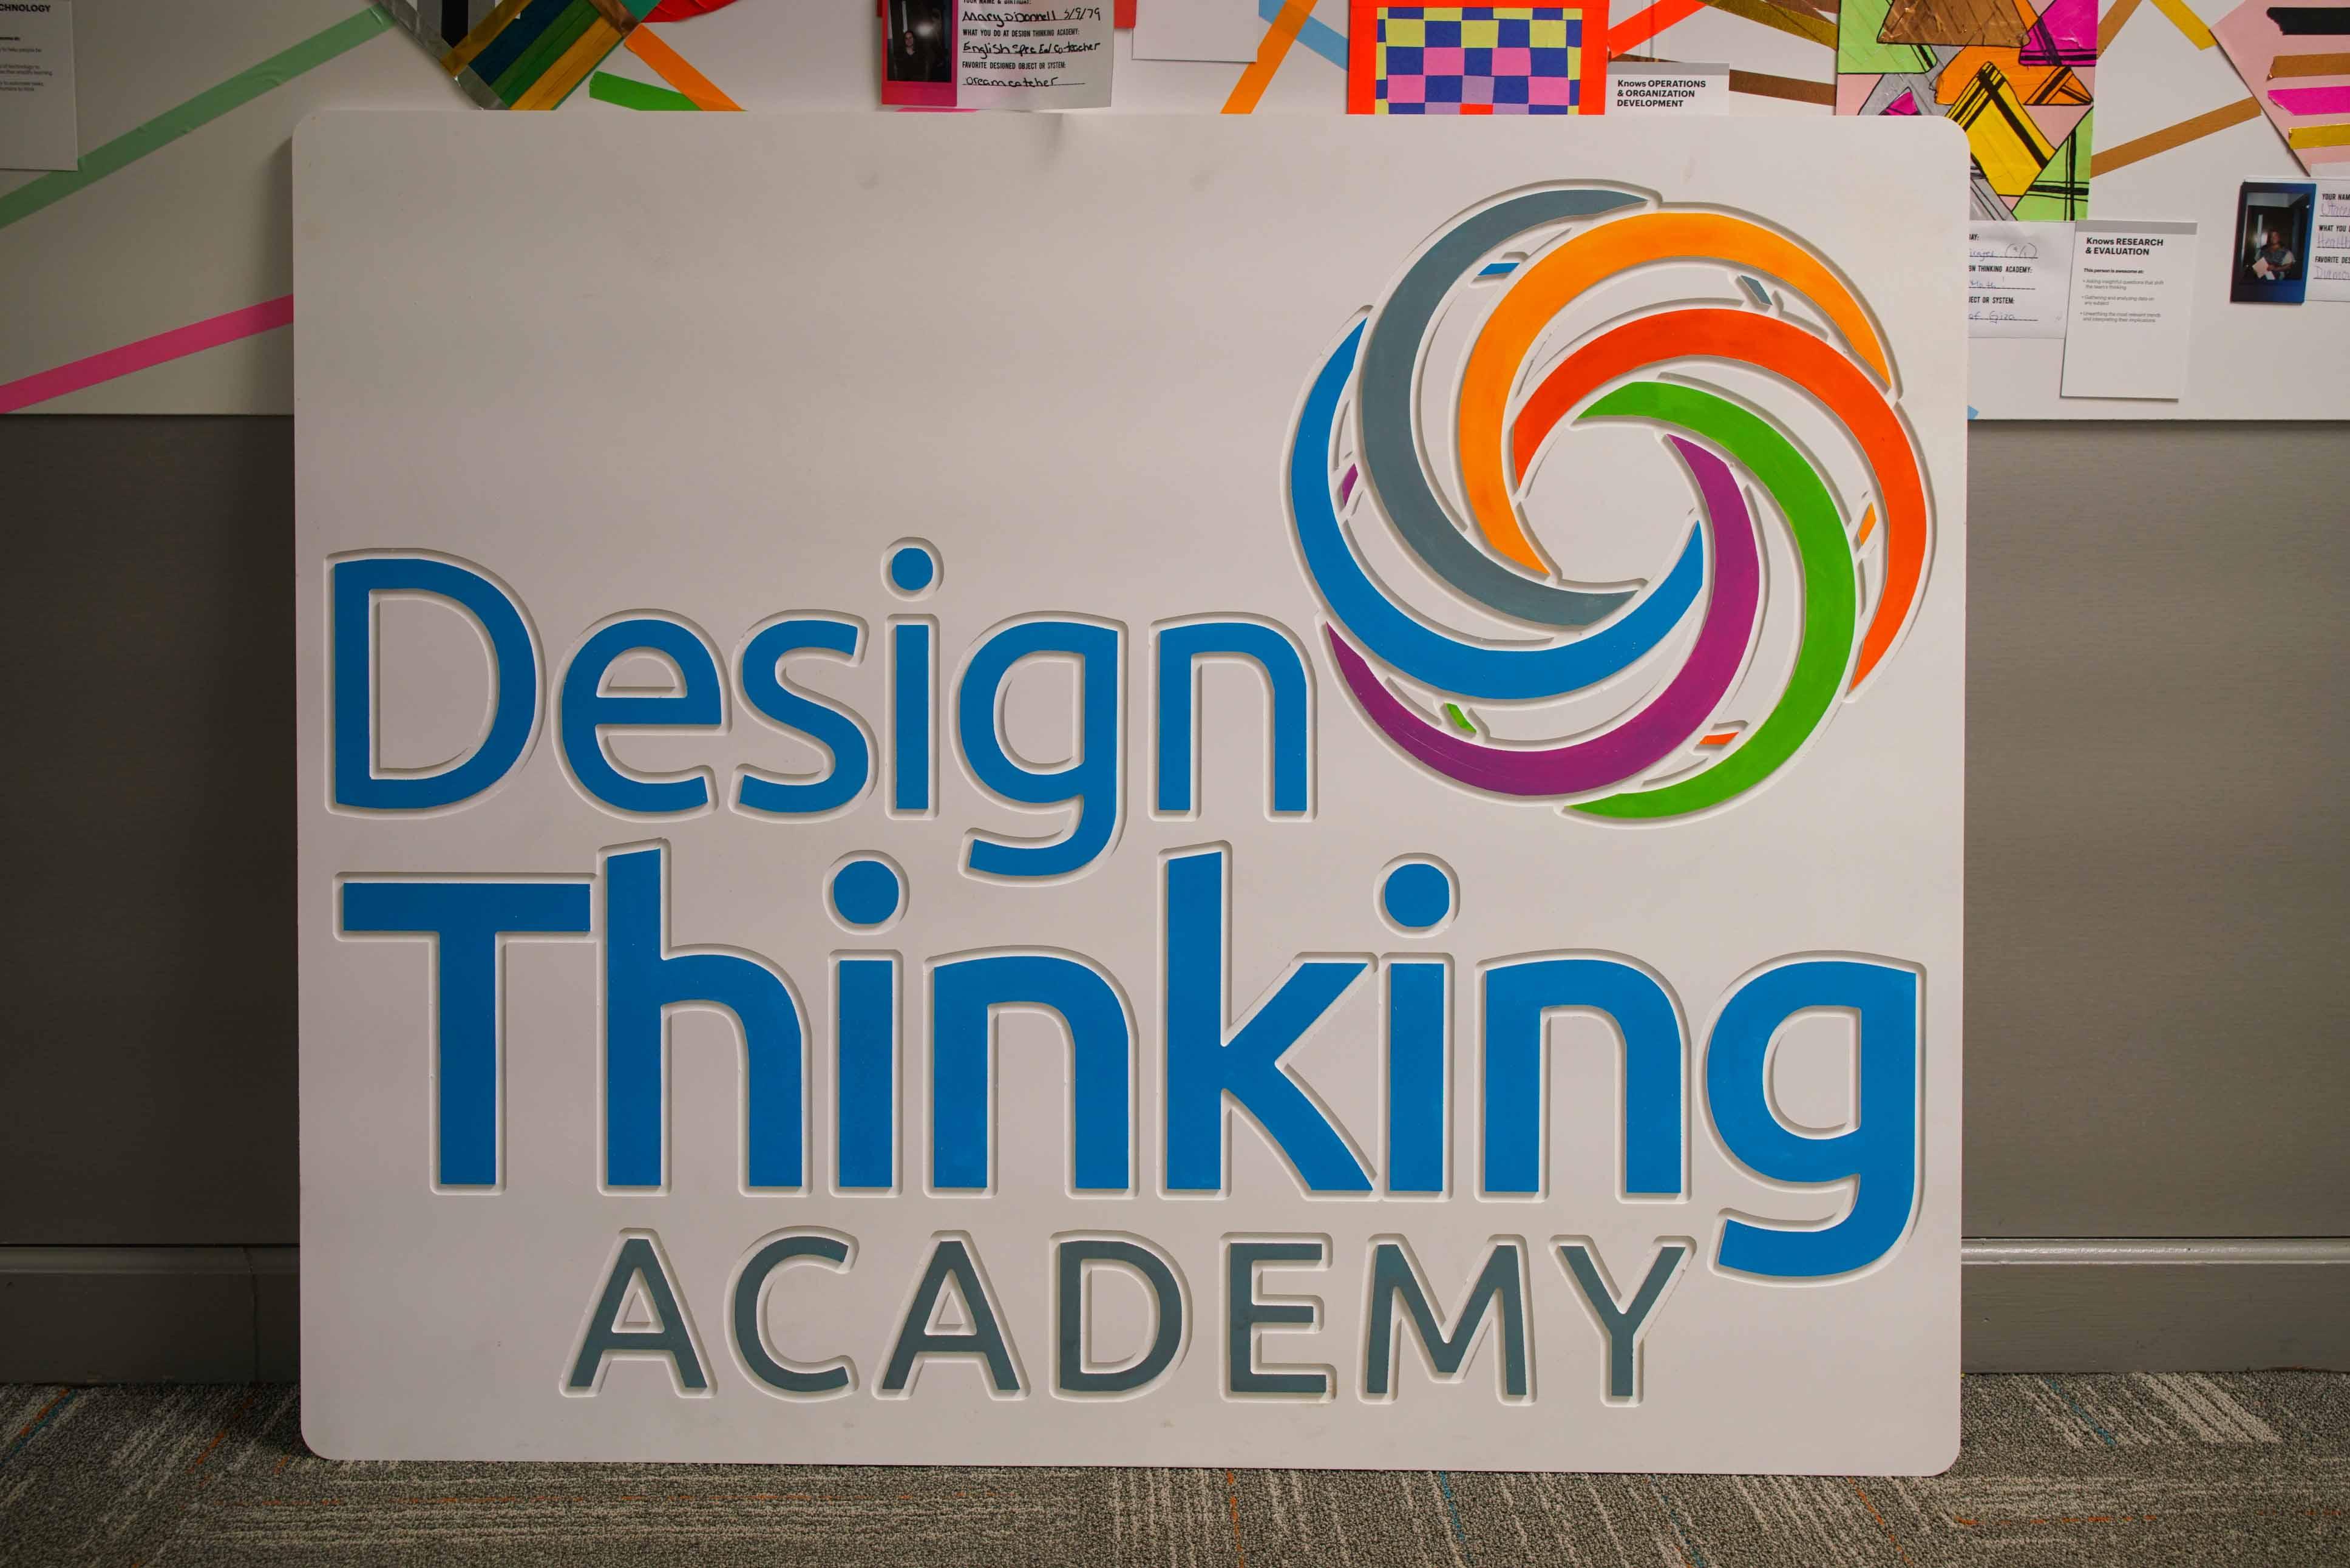 Design Thinking Academy rebrands